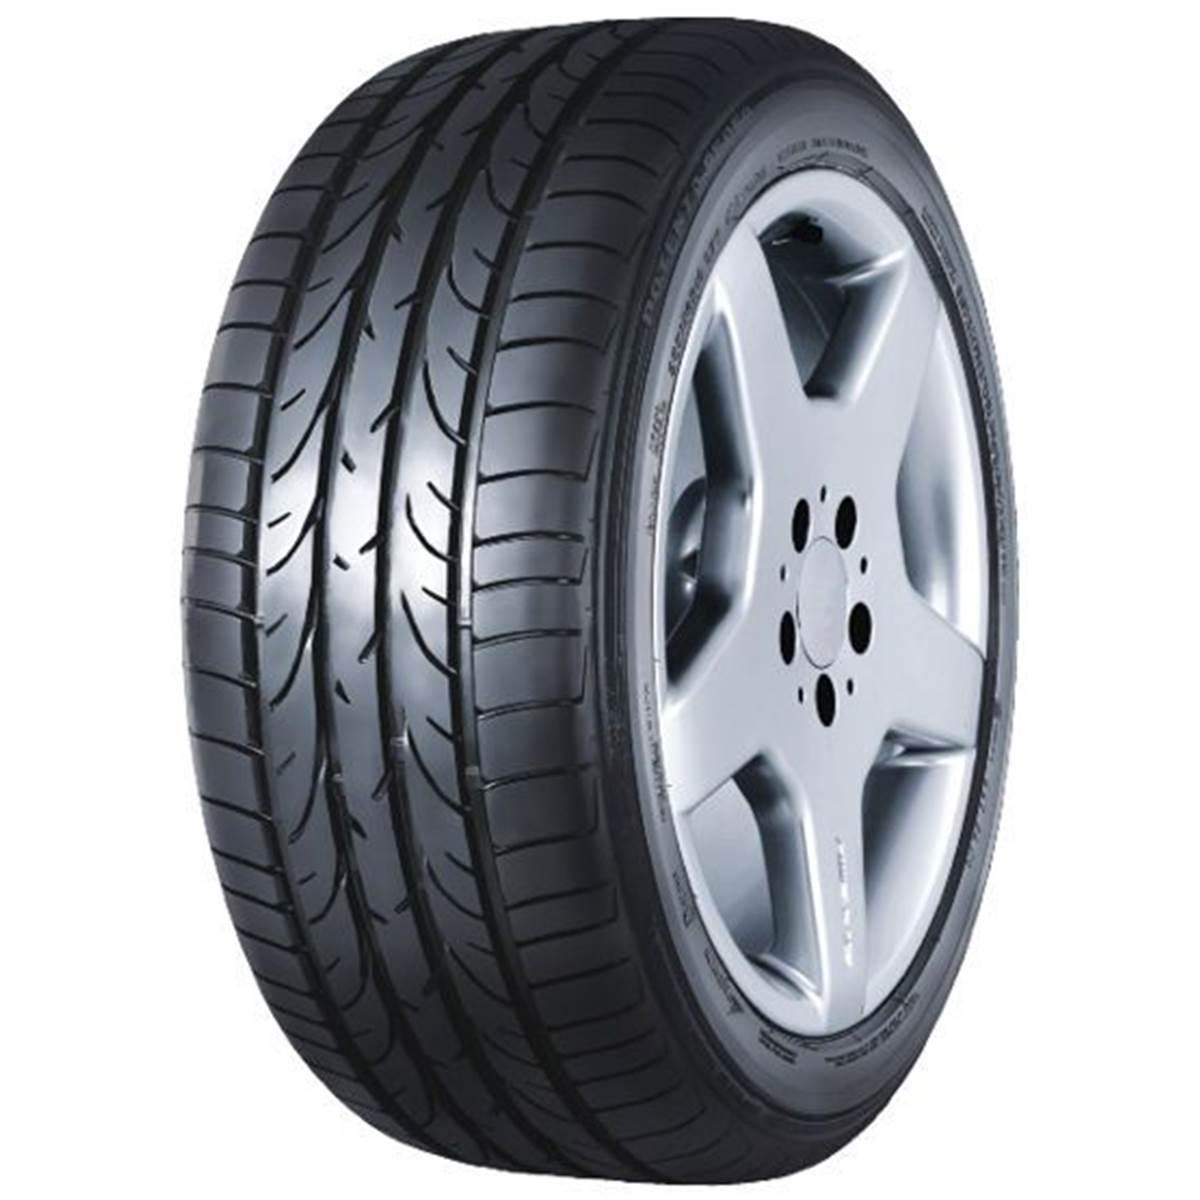 Pneu Bridgestone 225/45R17 90W Potenza Re050 Symmetric